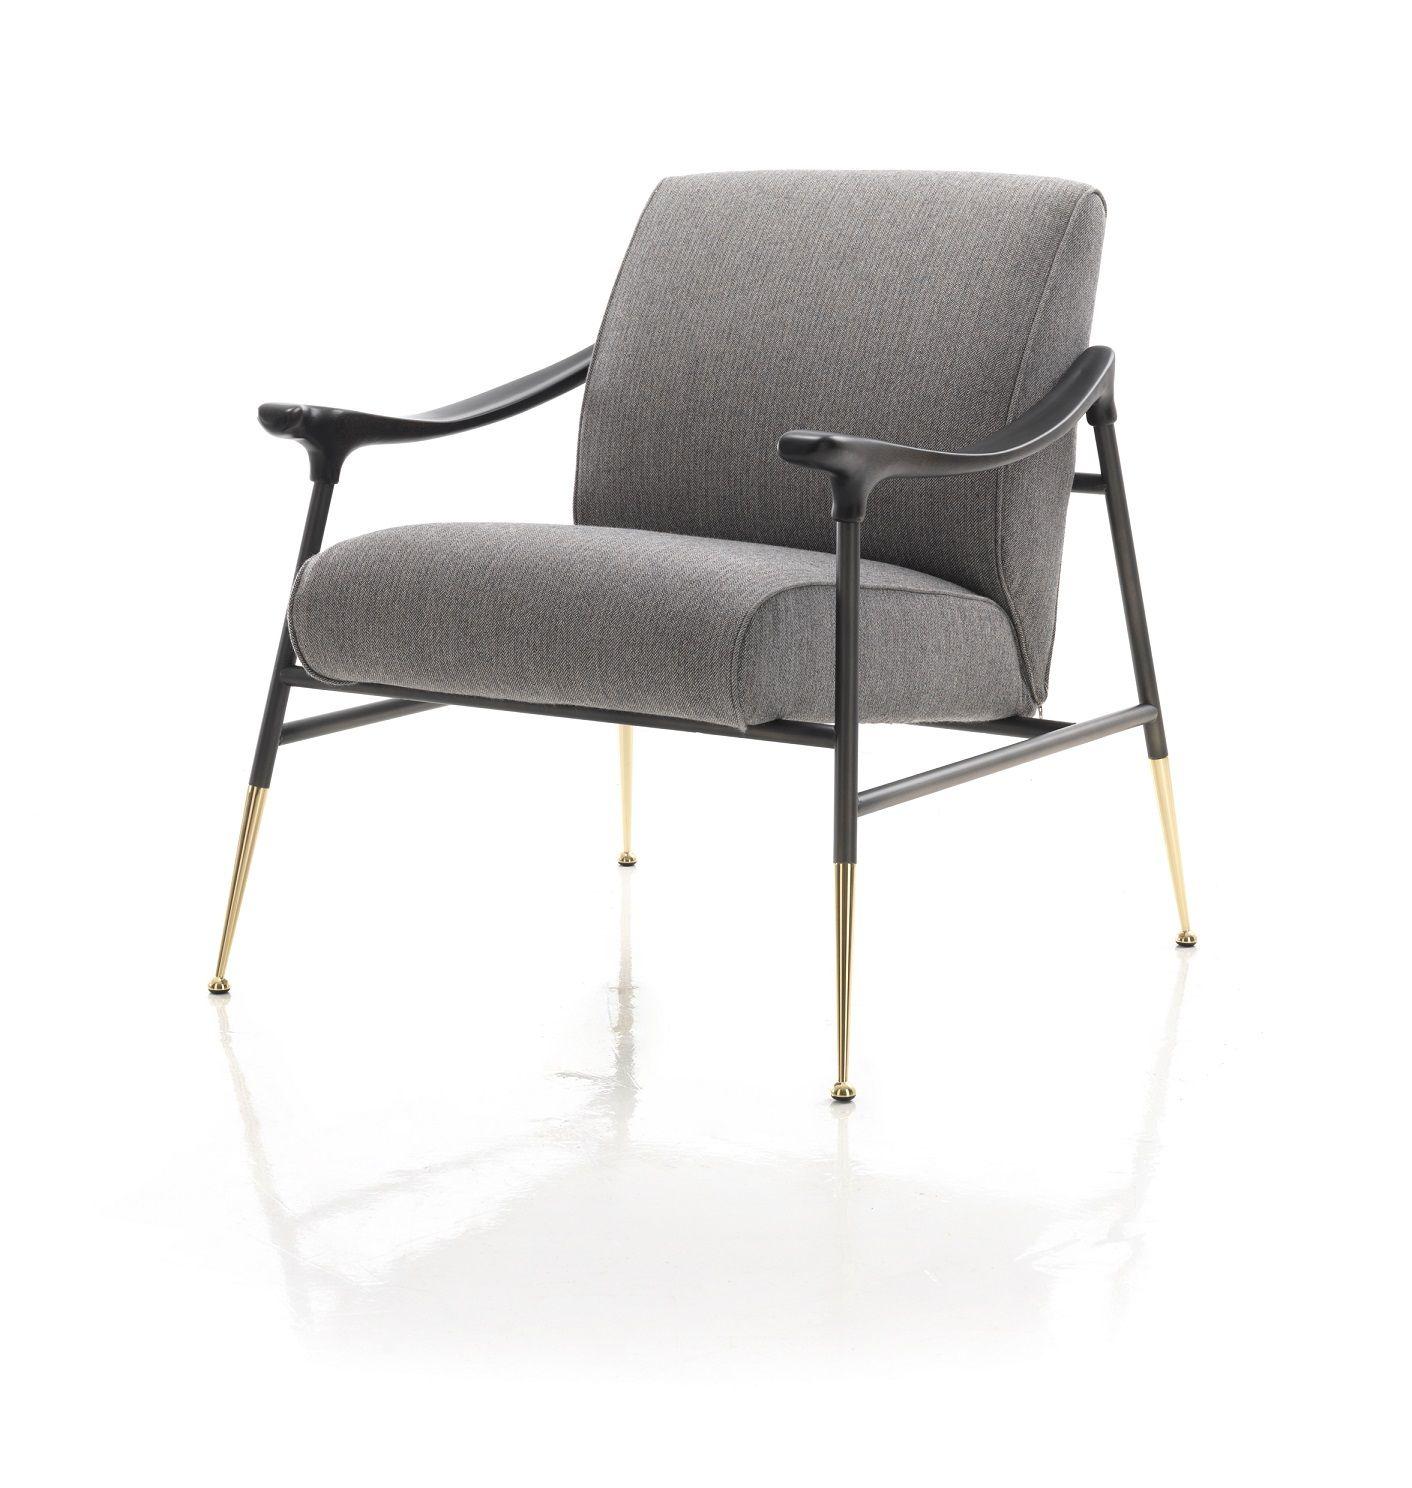 miura armchair by tosconova sofa furniture ikea rh pinterest com